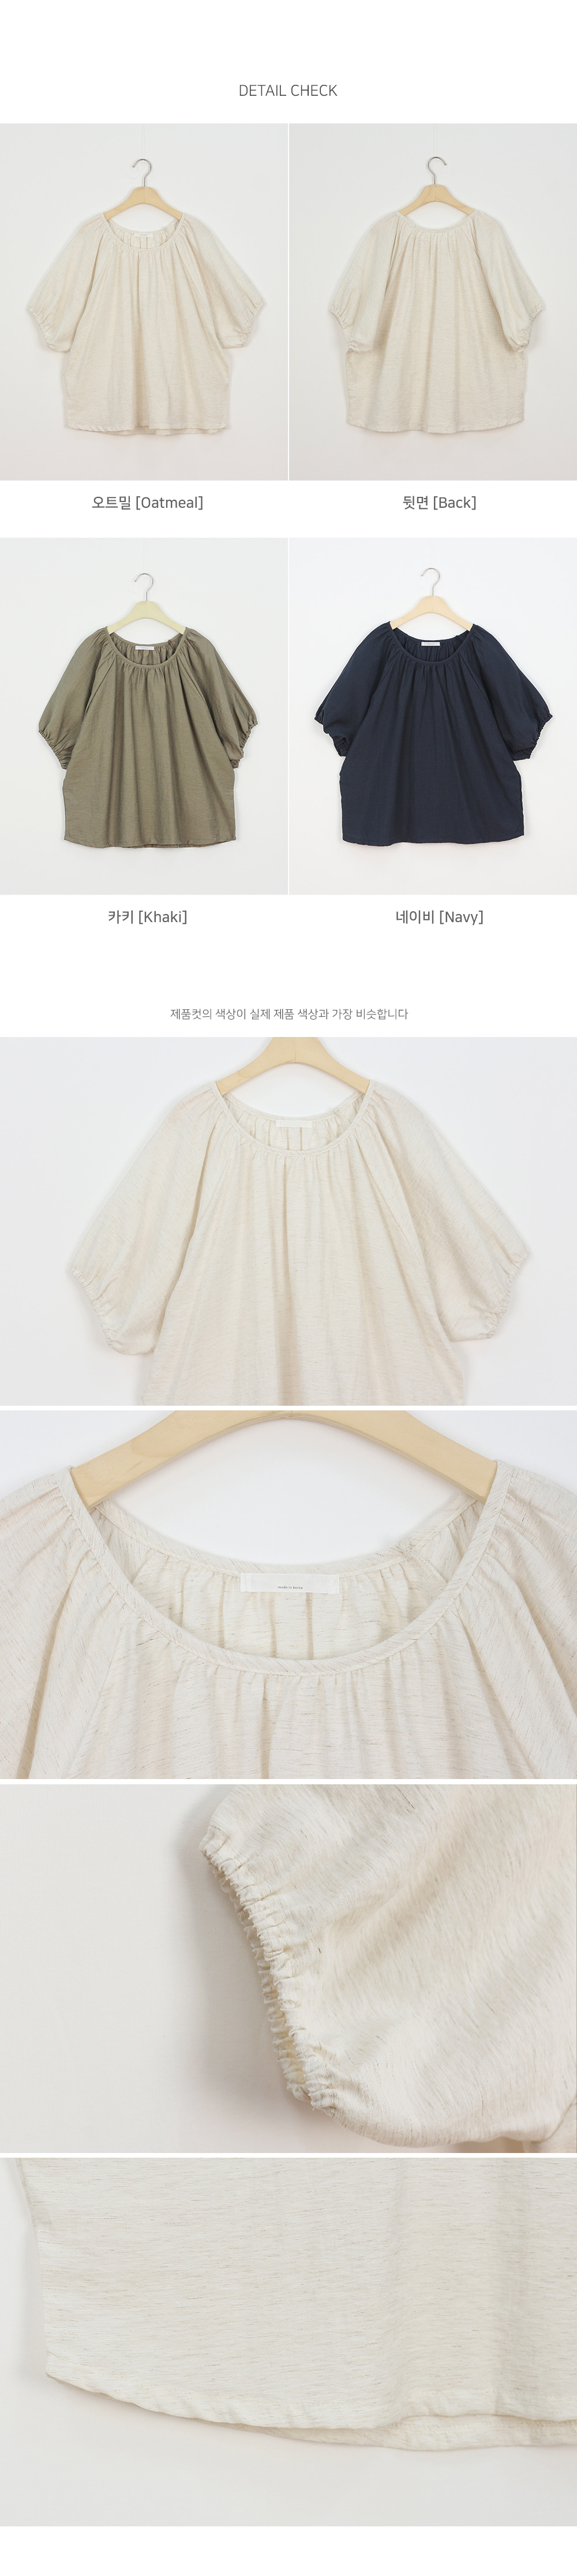 Mellund puff sleeve blouse